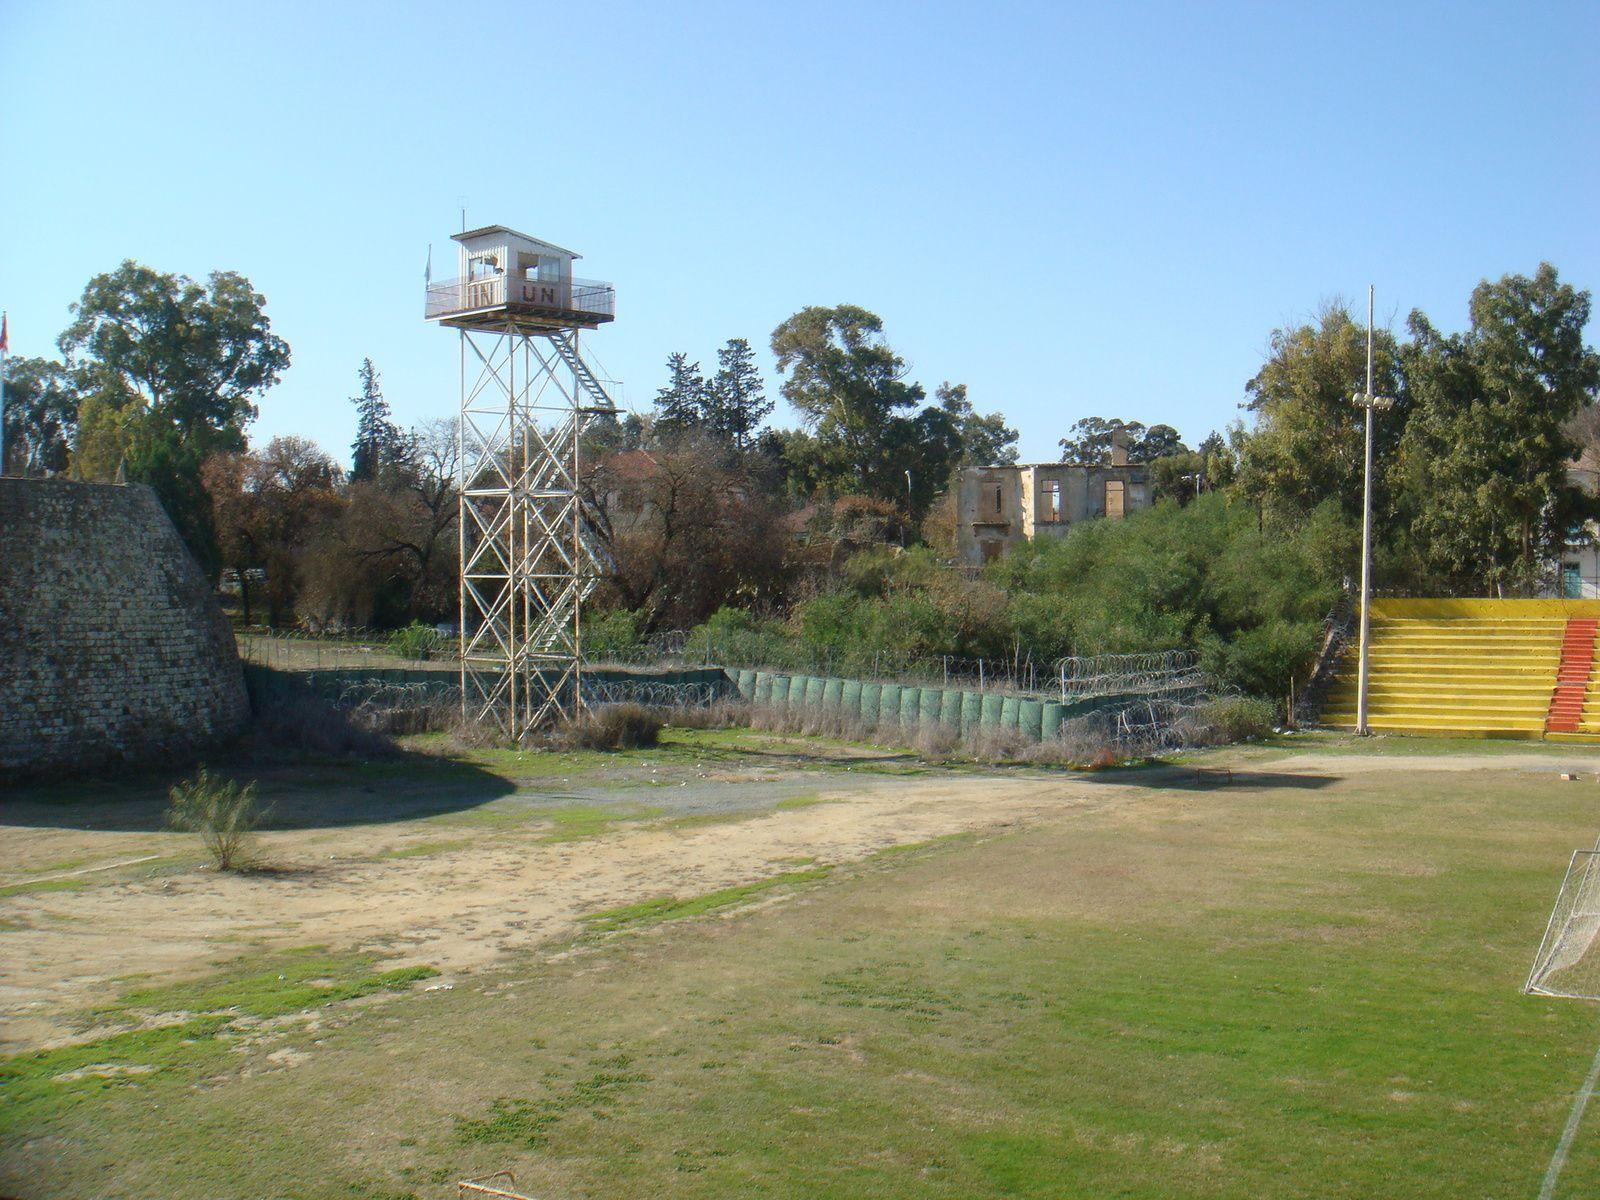 Zone verte administrée par l'ONU (Nicosie, 2011).